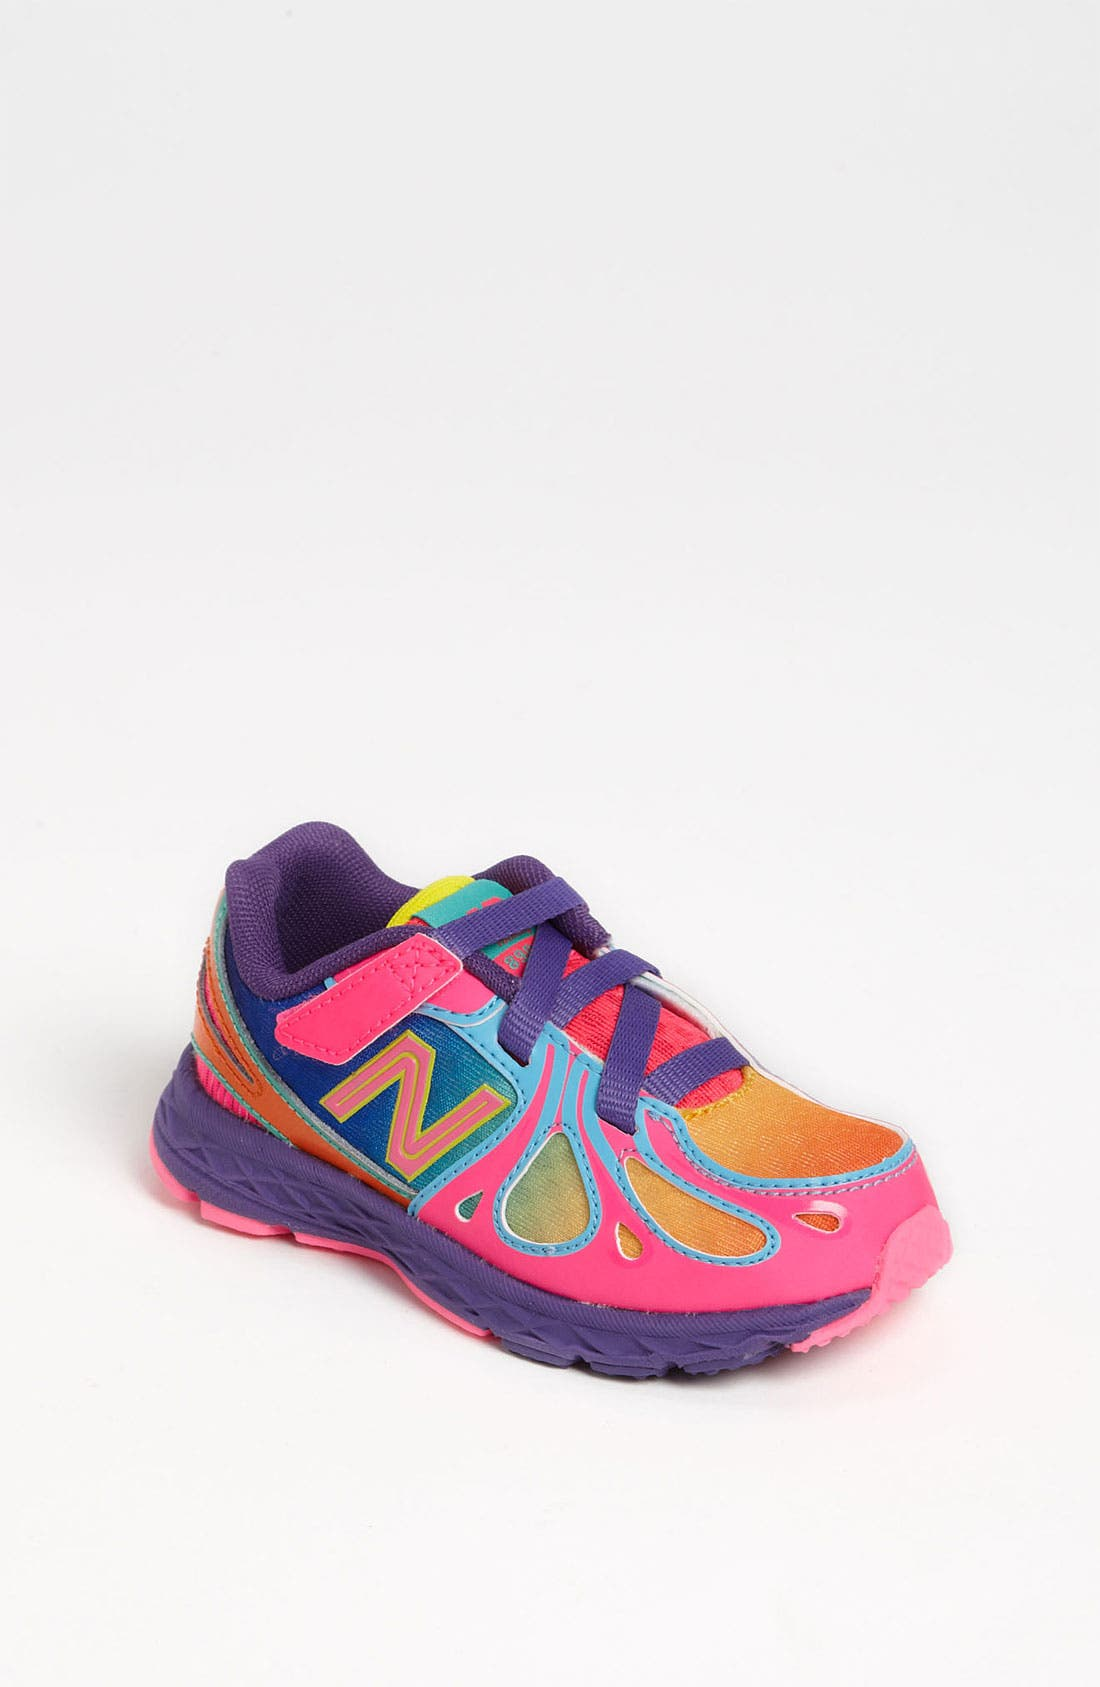 Alternate Image 1 Selected - New Balance '890' Sneaker (Baby, Walker & Toddler)